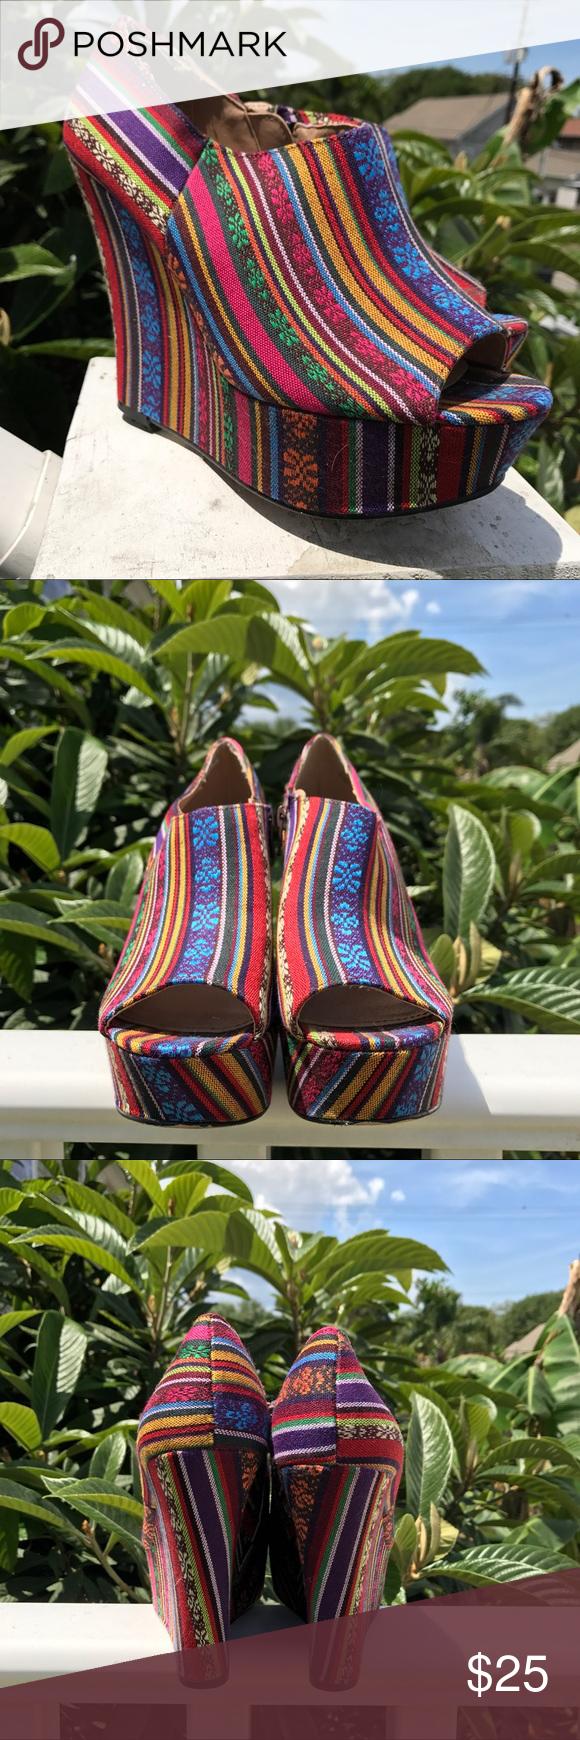 "Steve Madden baja wedges 🌈 🏝 ""Tribal print"" platform wedge sandals from Steve Madden. 5"" heel // 1  3/4"" platform. 🌹 If these are your size make an offer (^。^) Steve Madden Shoes Wedges"